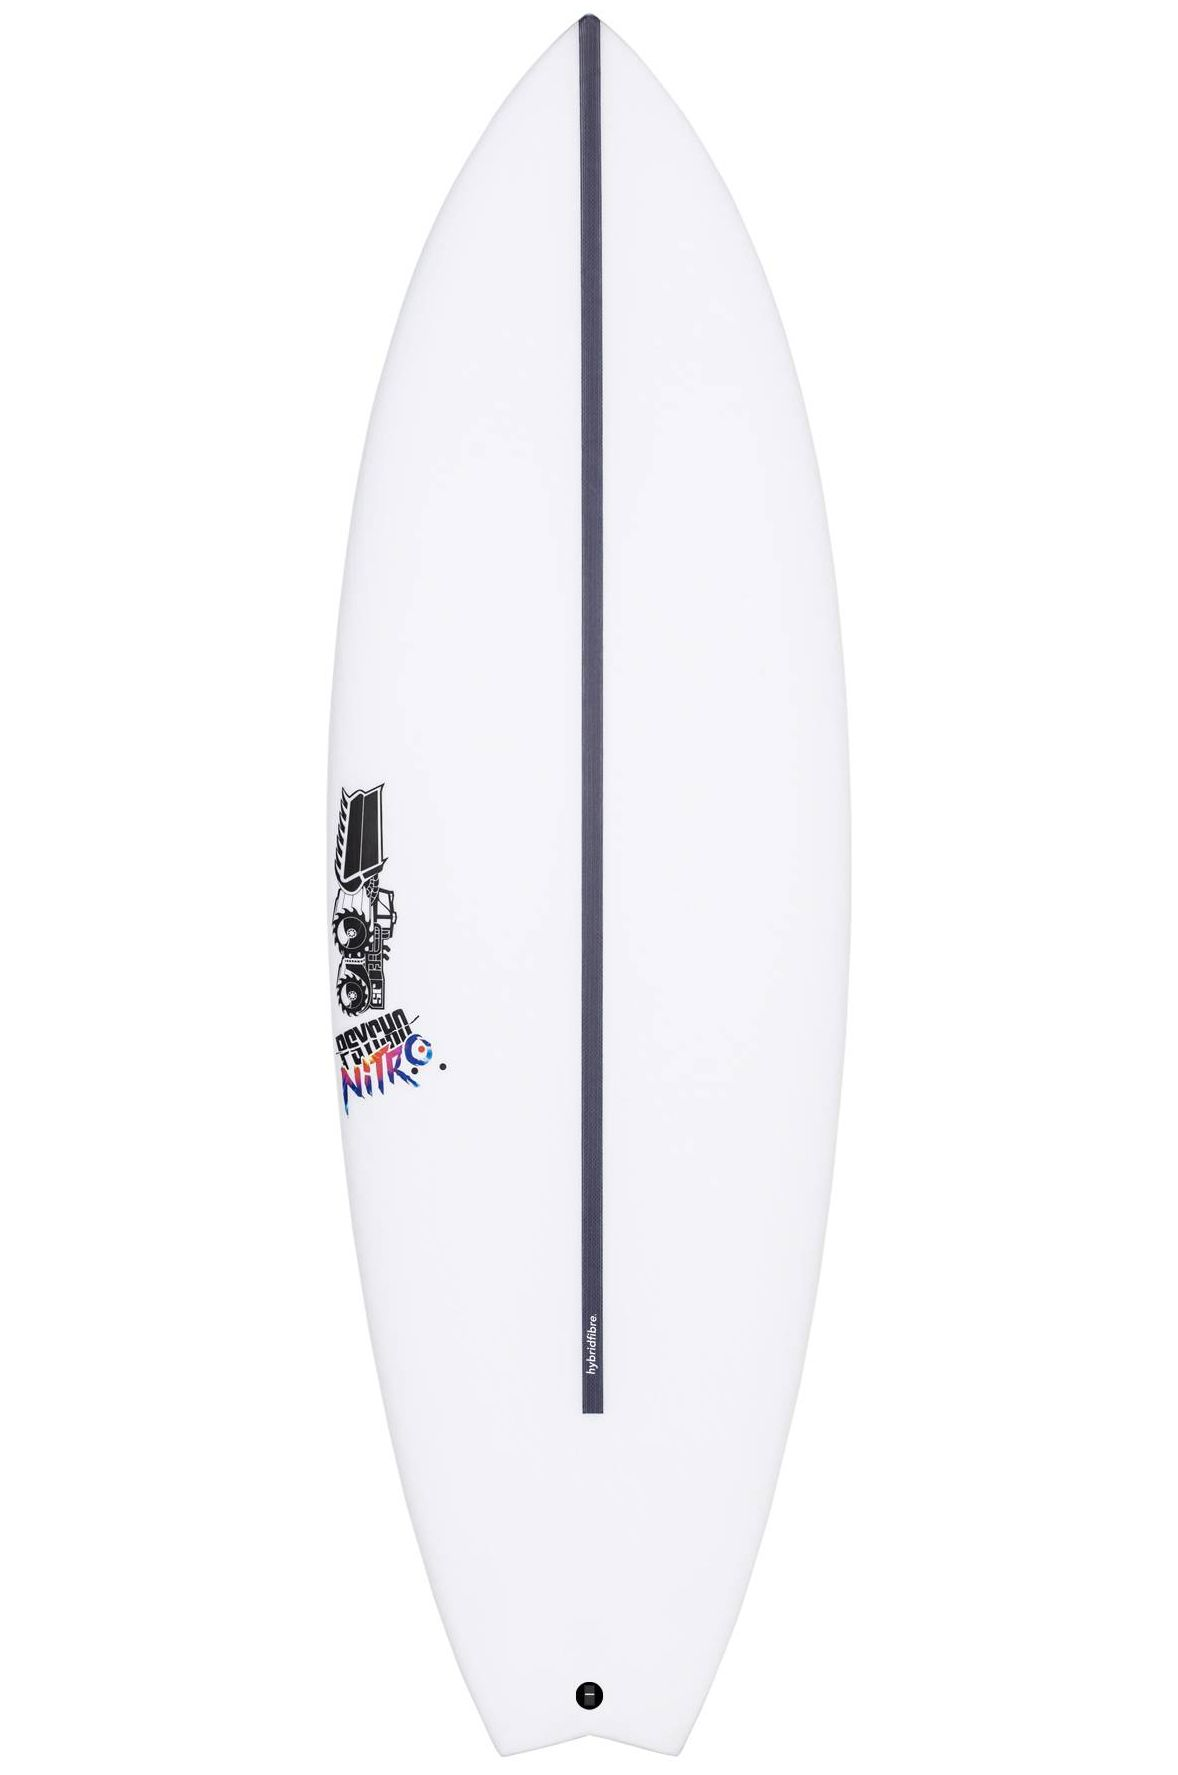 Prancha Surf JS 5'7 PSYCHO NITRO HYFI Swallow Tail - White FCS II Multisystem 5ft7